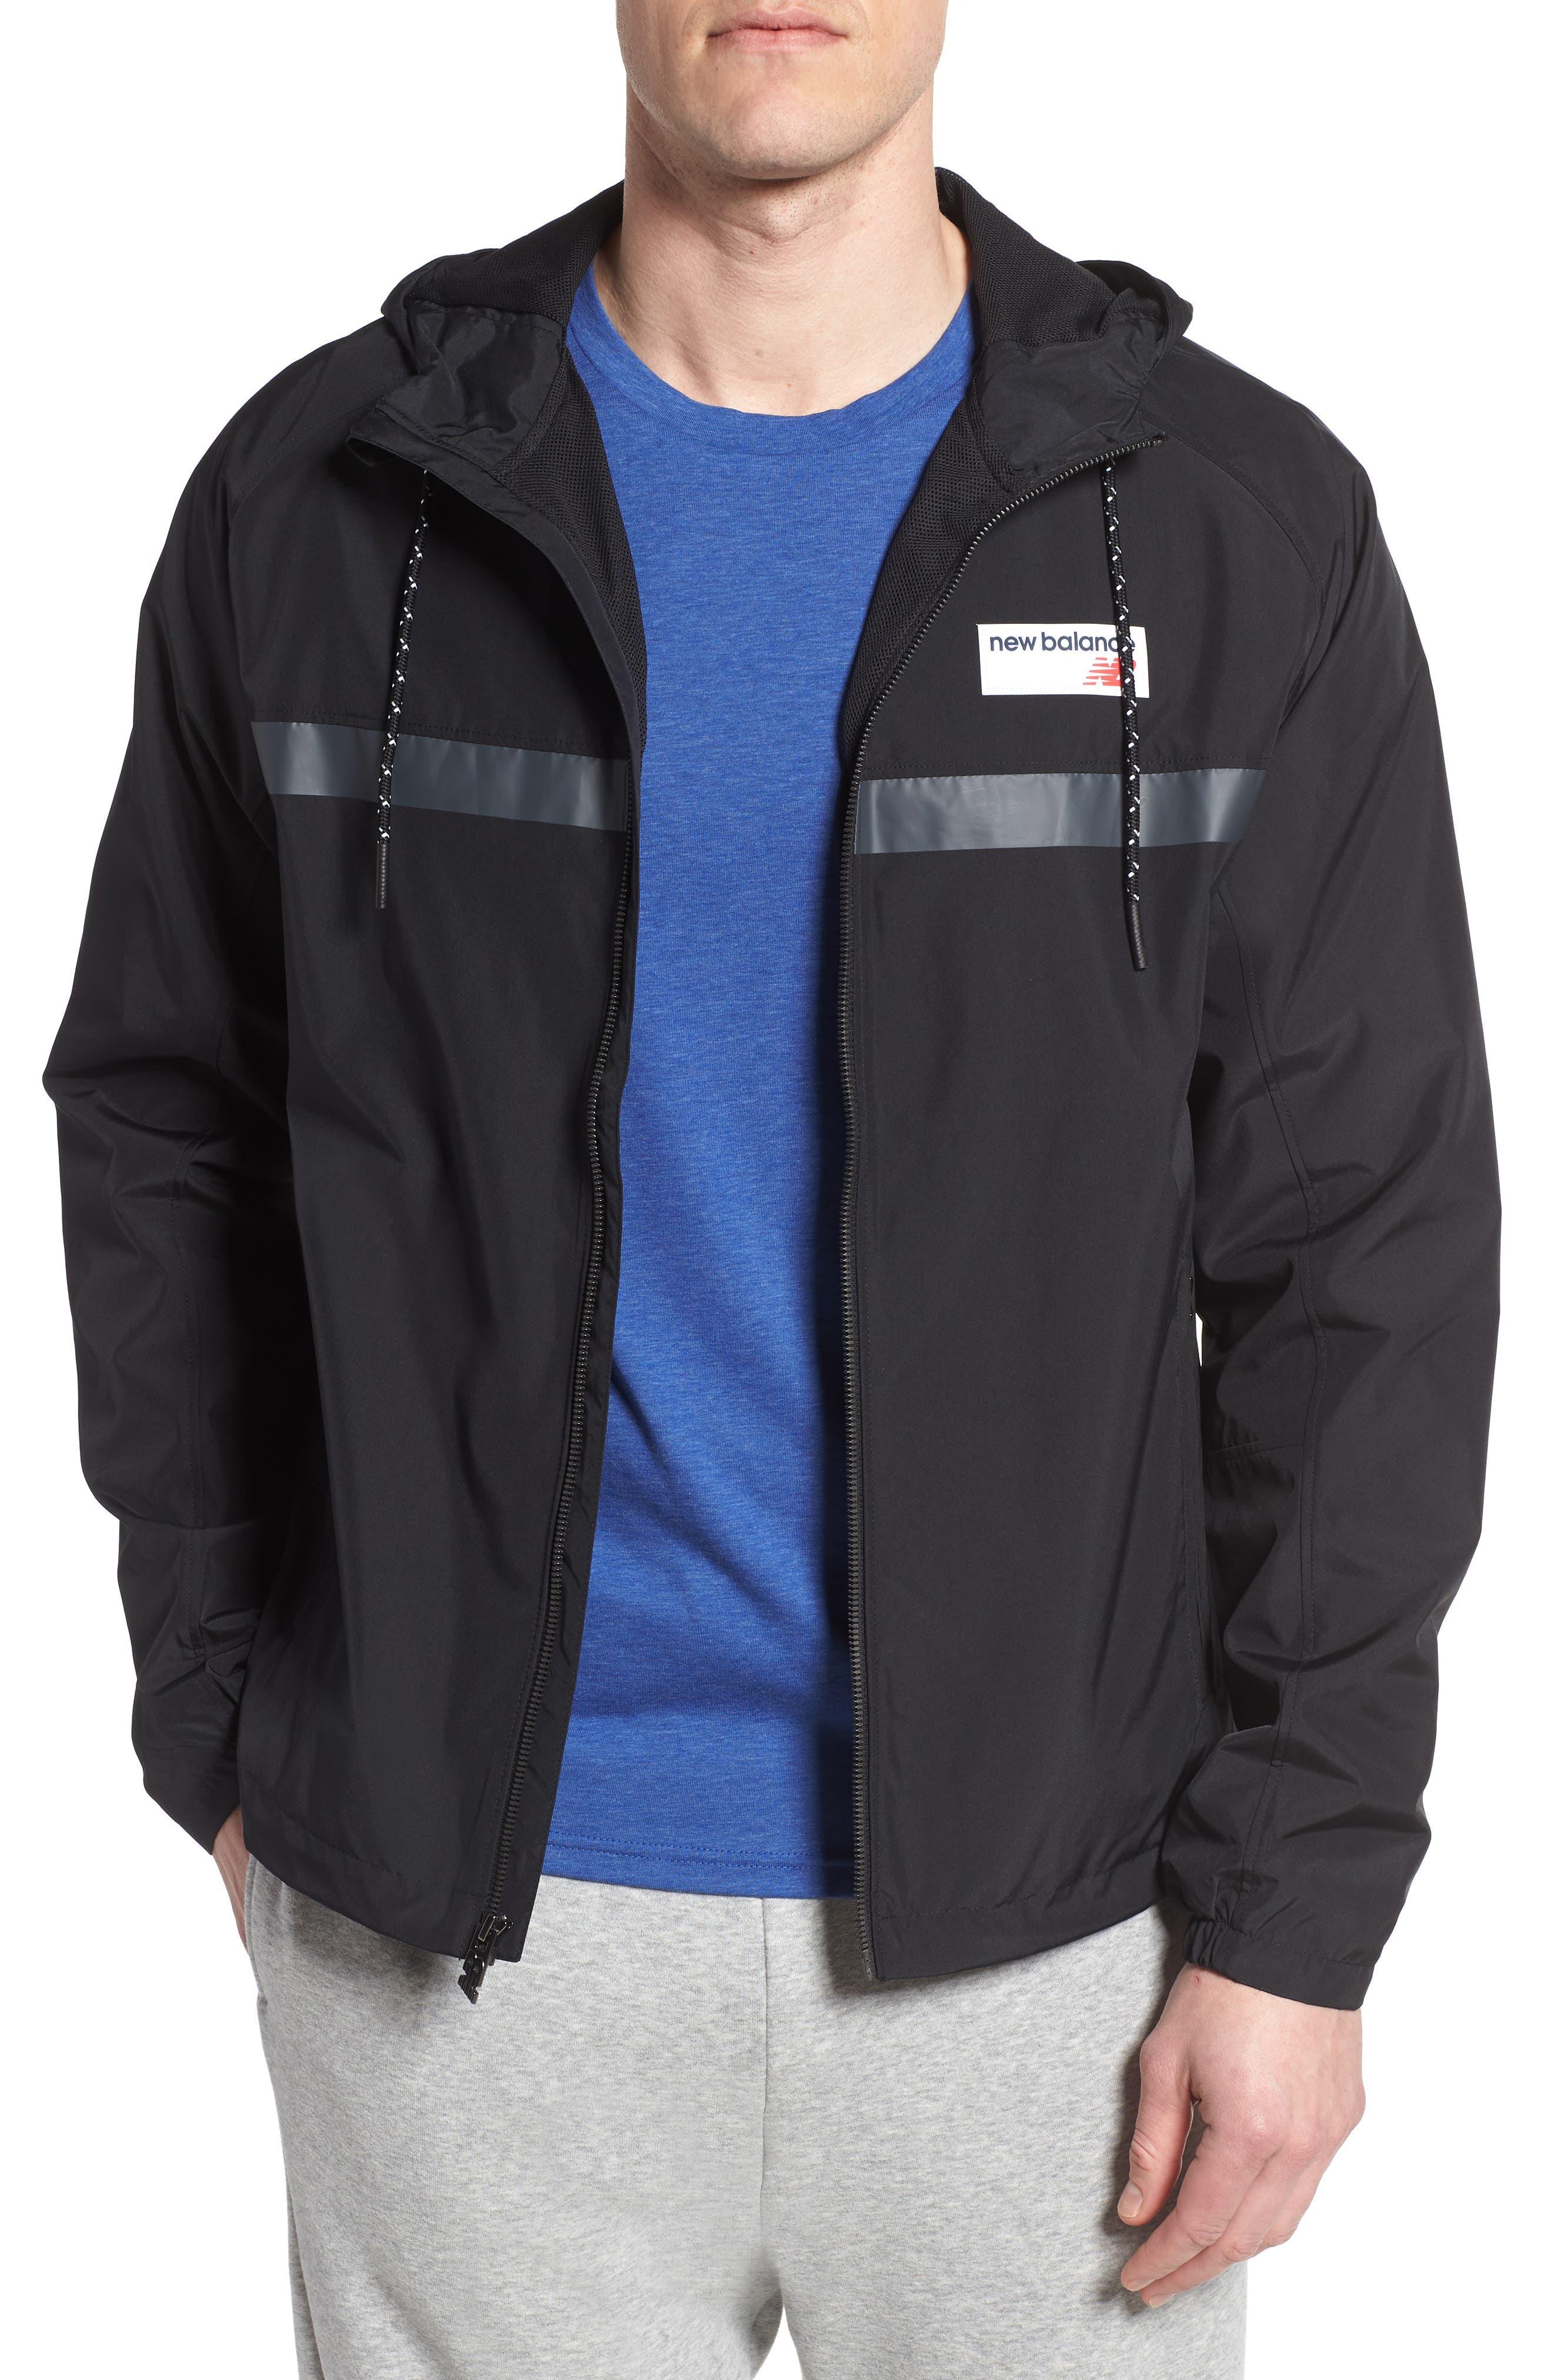 New Balance Athletics 78 Jacket, Black